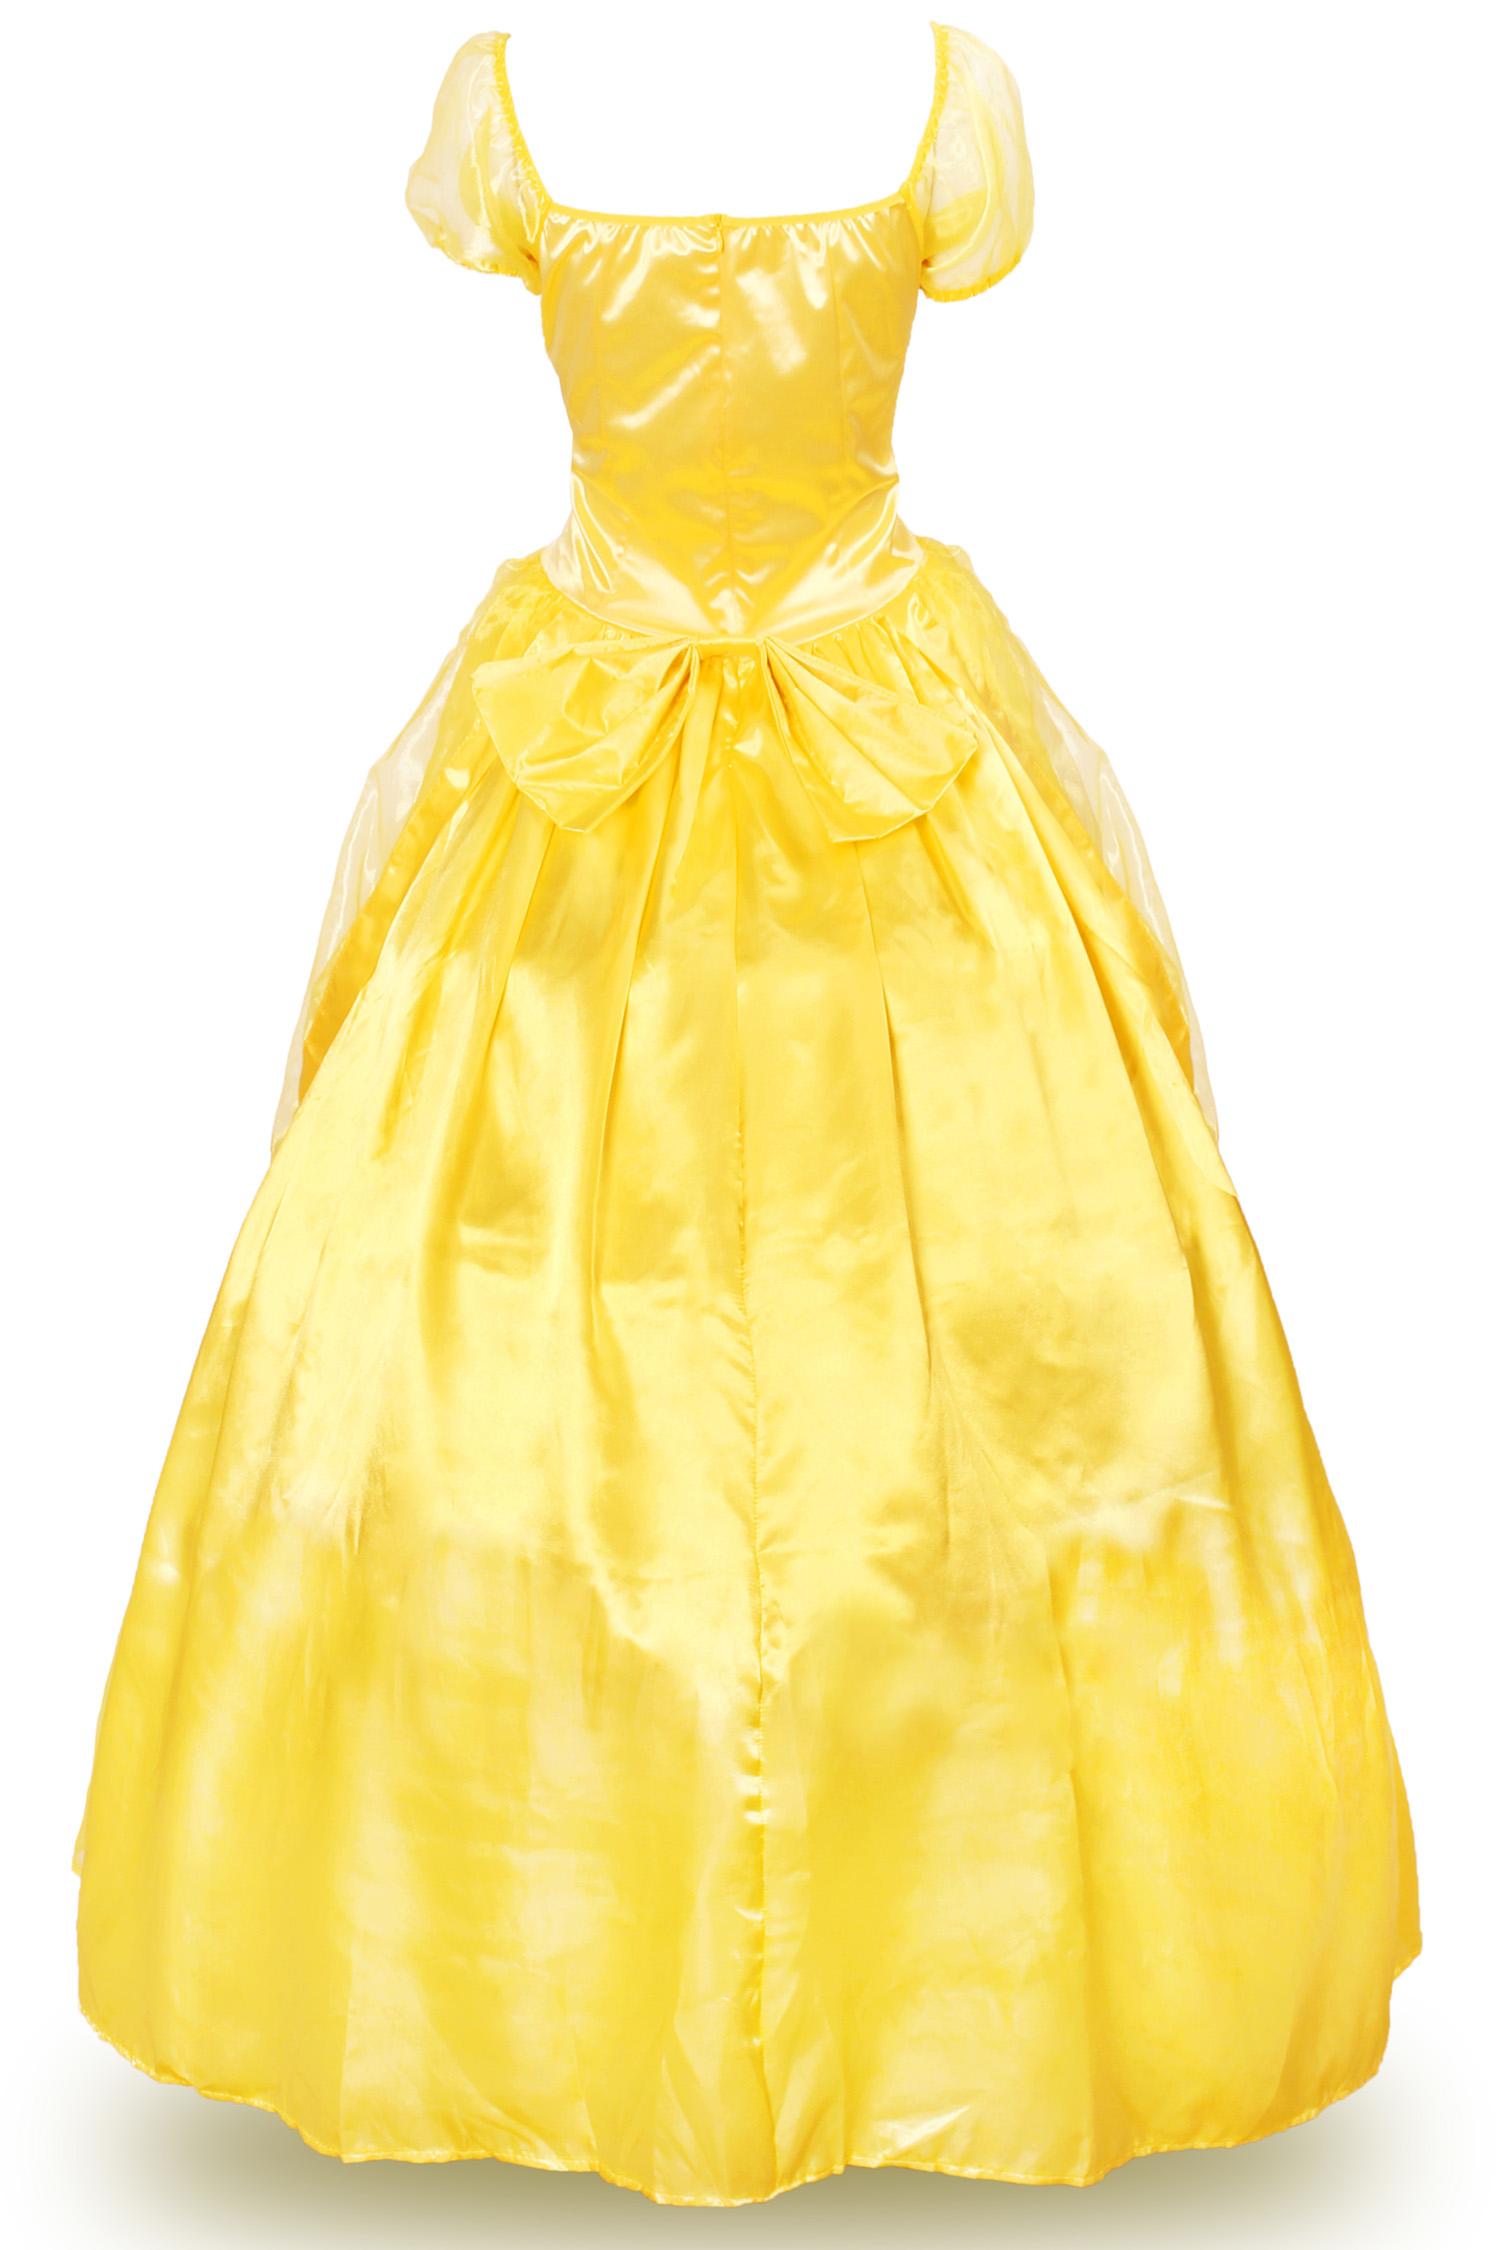 Adult Belle Costume Princess Dress for Women Classic Ball Gown Dress ...